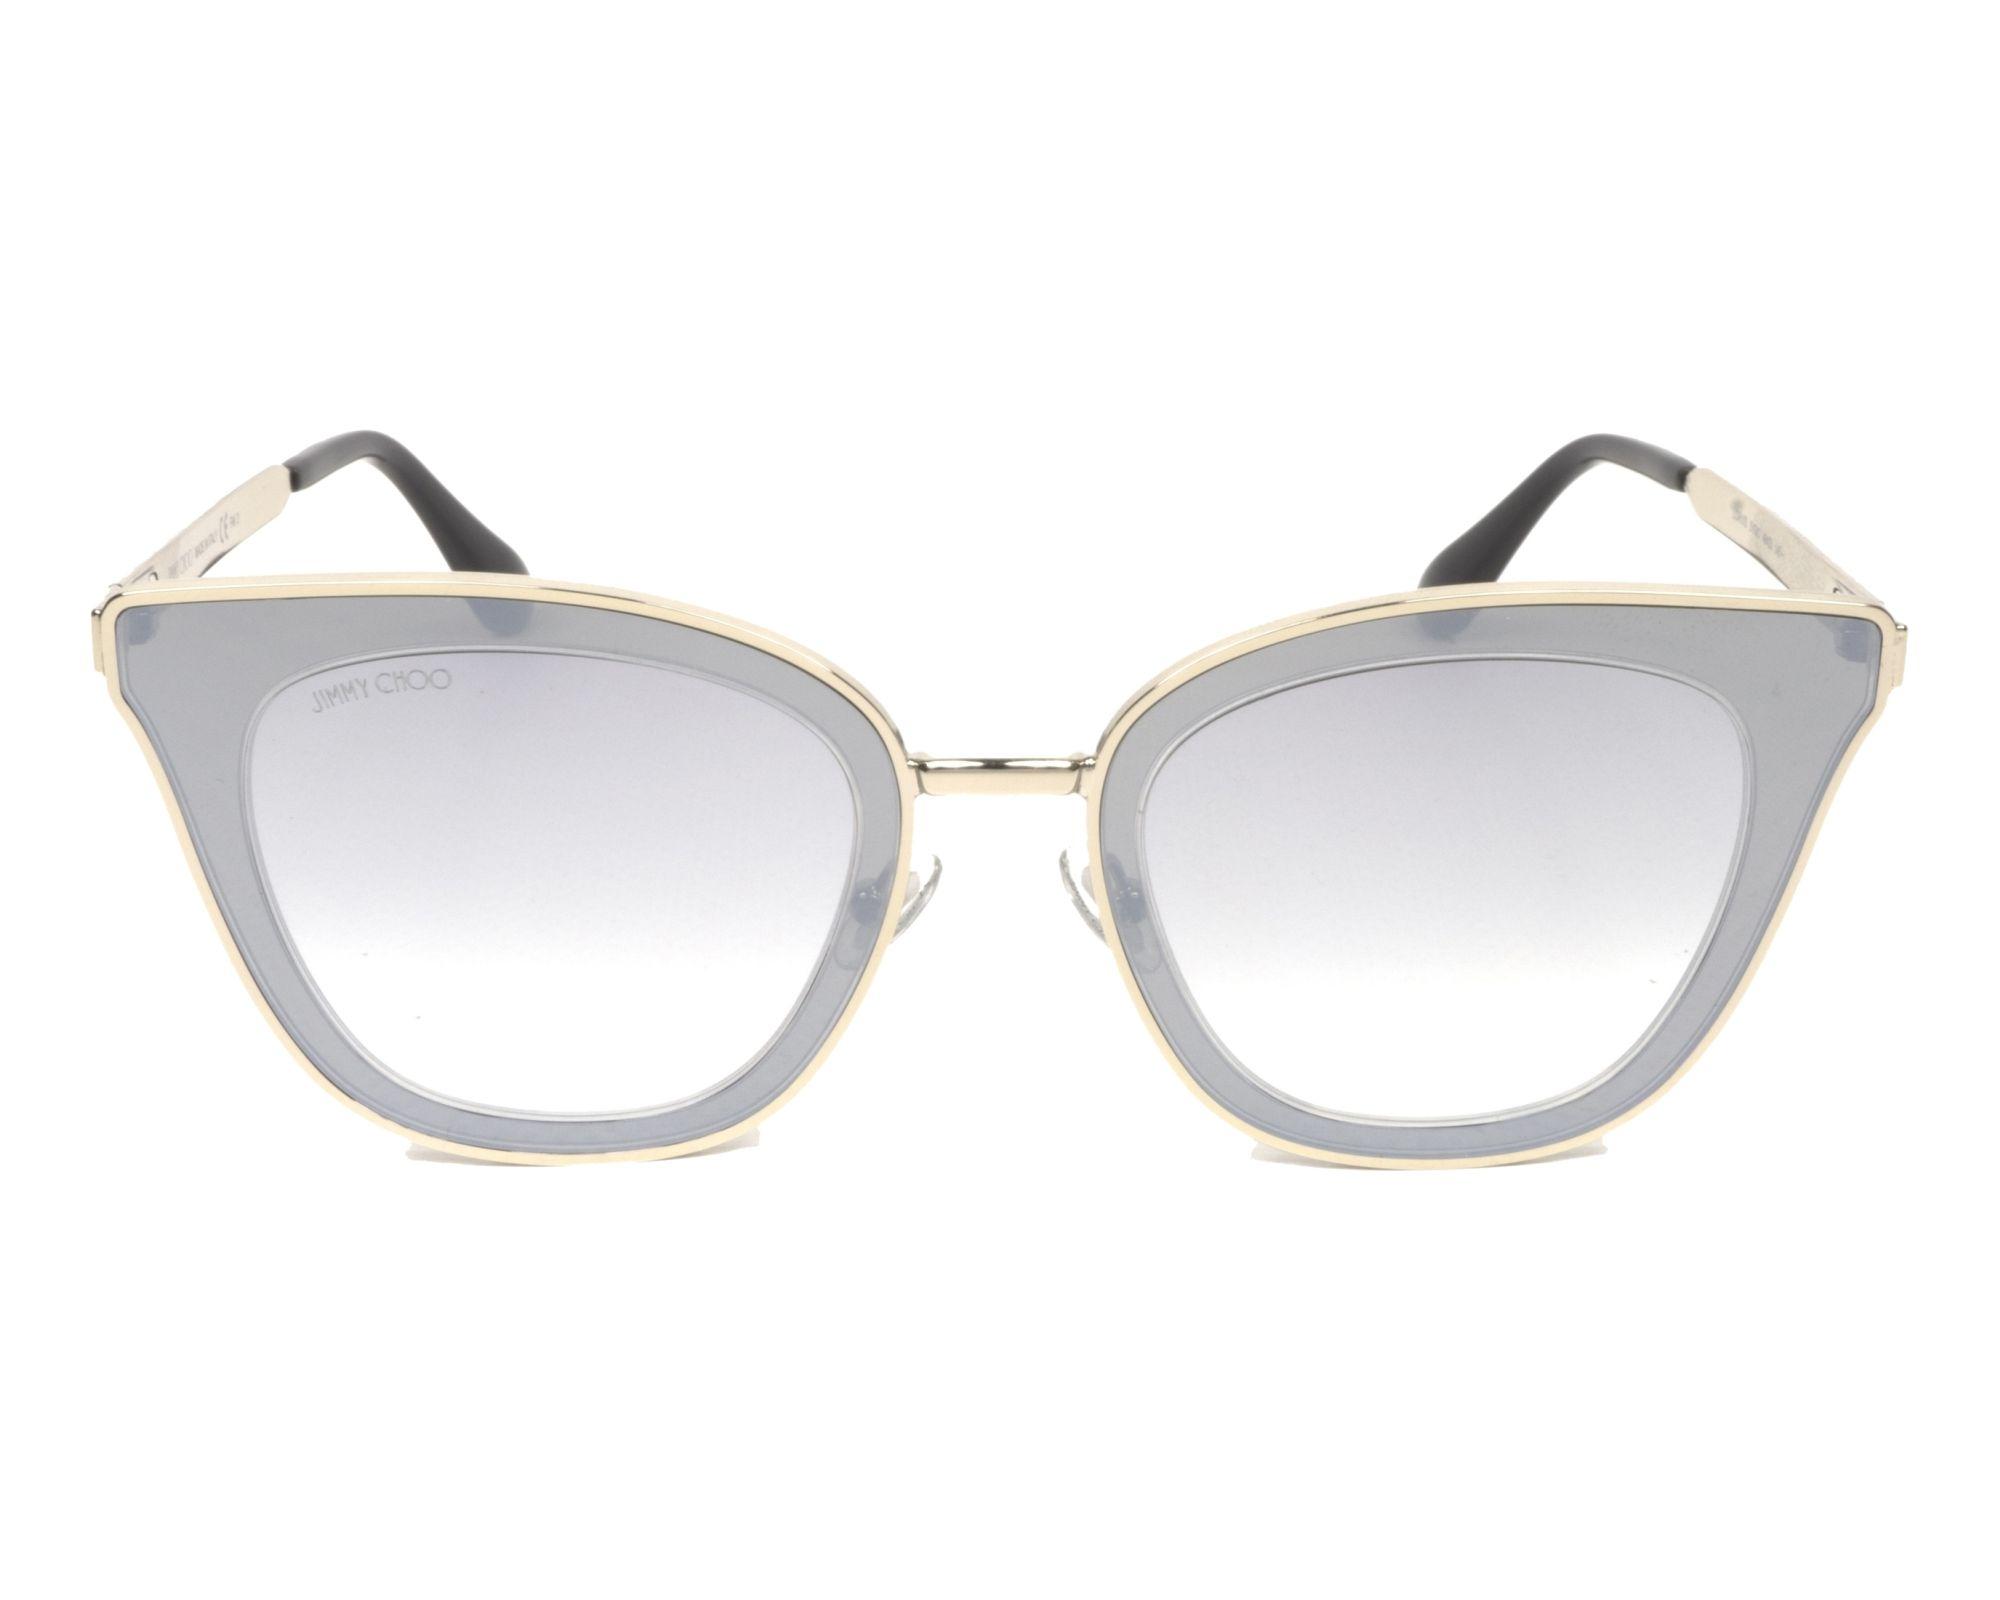 57da9faf7e4e Sunglasses Jimmy Choo LORY-S 3YG IC 49-23 Silver Silver front view